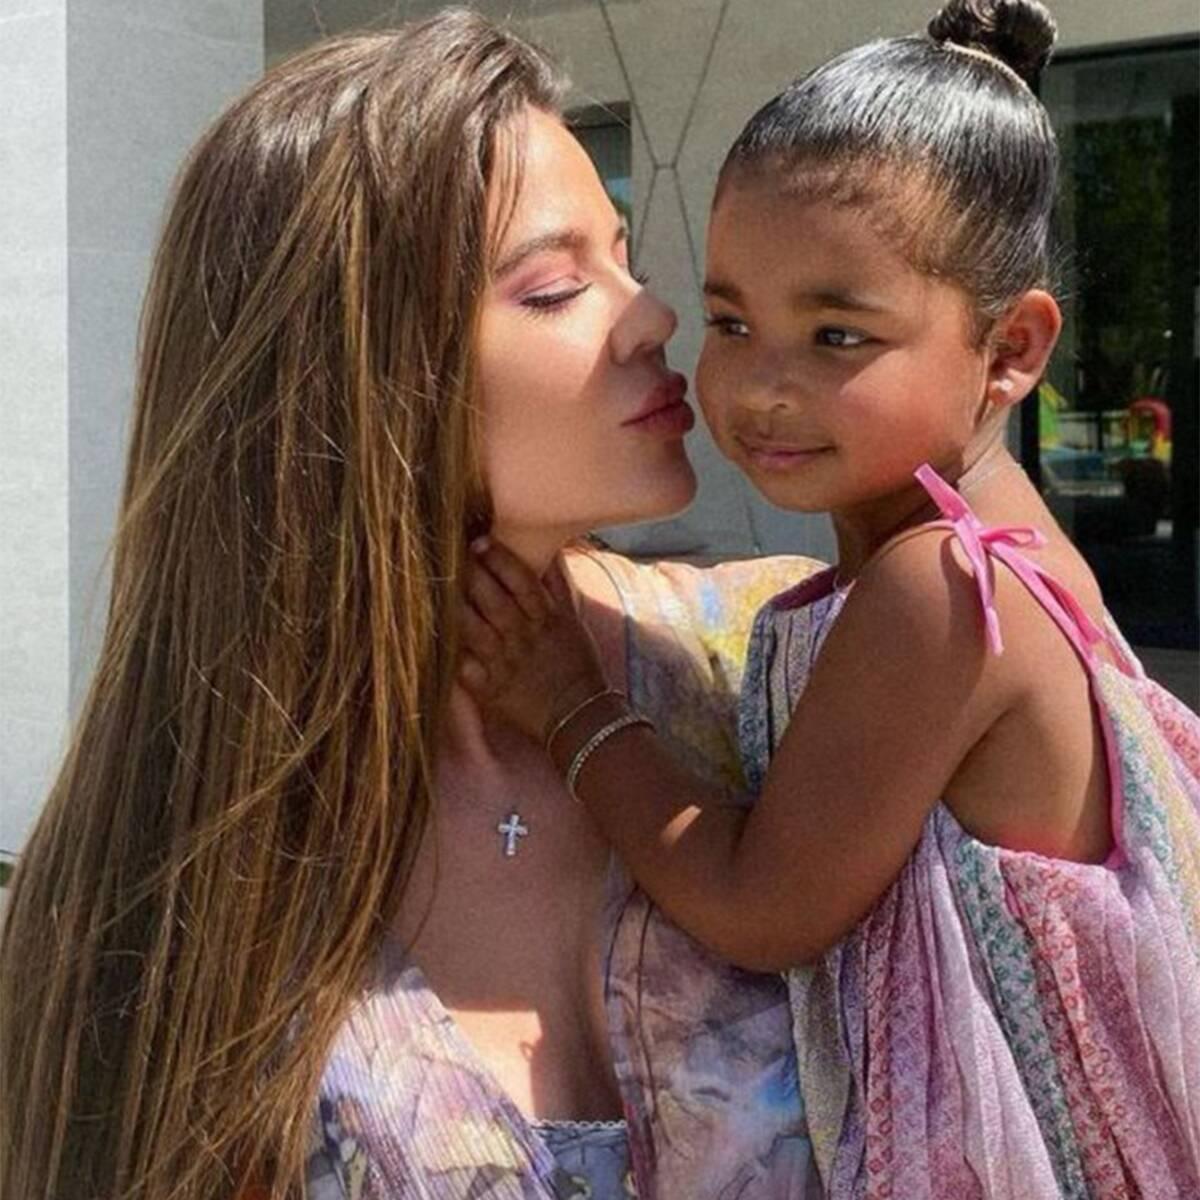 See Every Photo From Khloe Kardashian's Extravagant Birthday Celebration for True Thompson